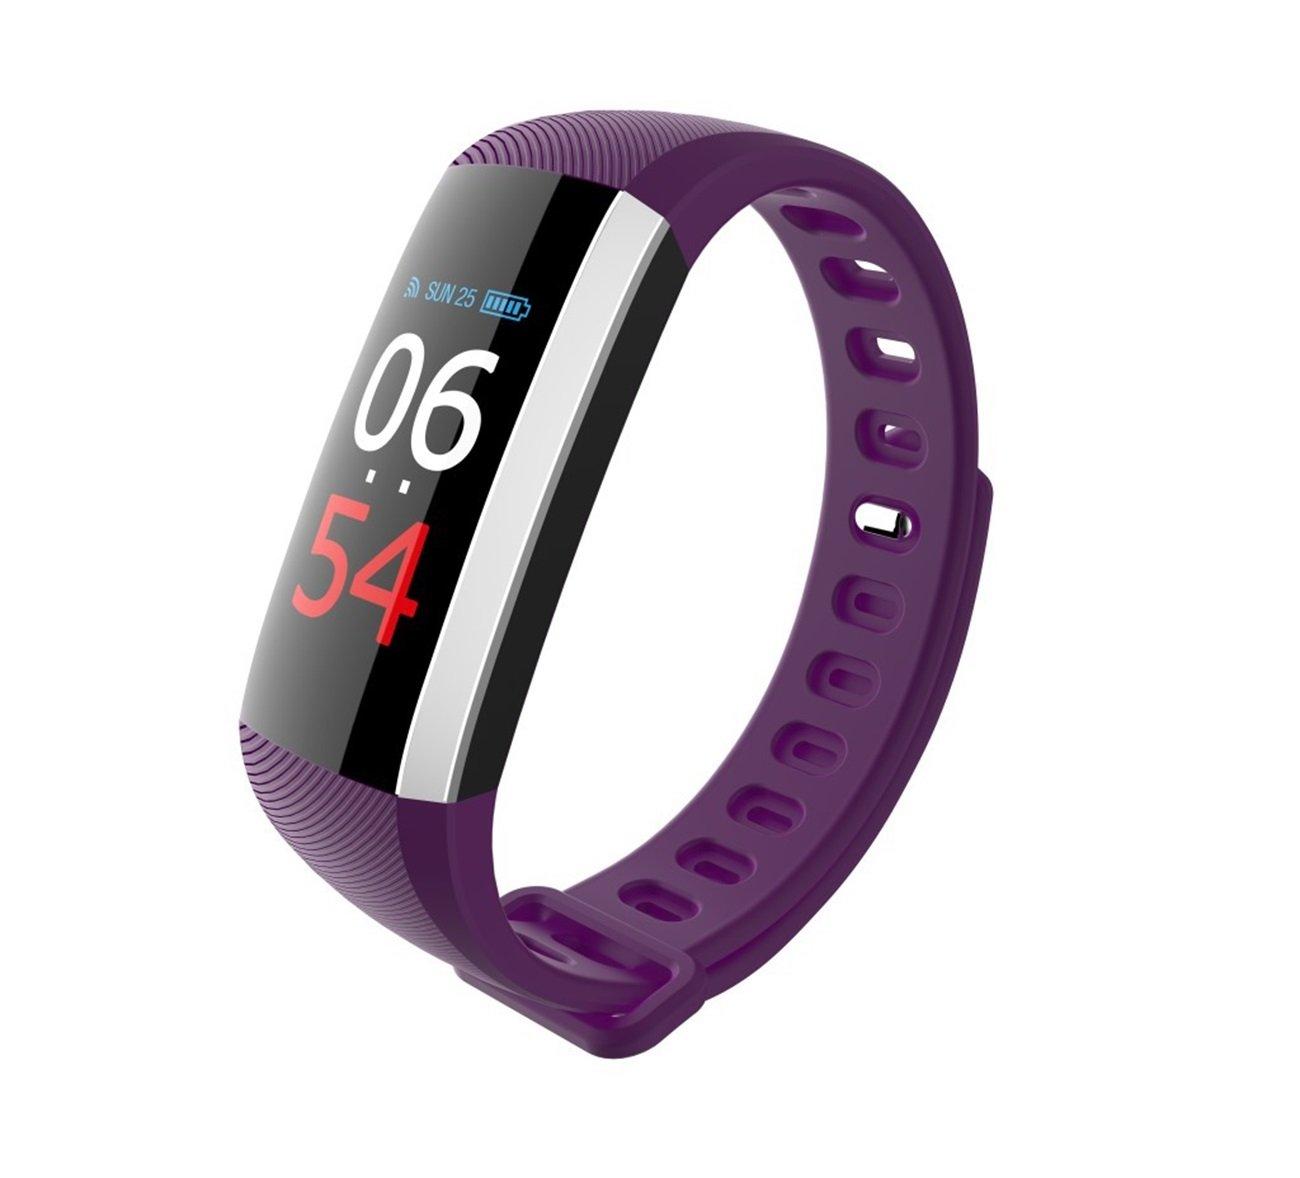 yzfdbsx Fitness Trackerハートレート血圧Oxygenスポーツブレスレット防水歩数計カラー画面Caller Infoプッシュ B07BL549Z1